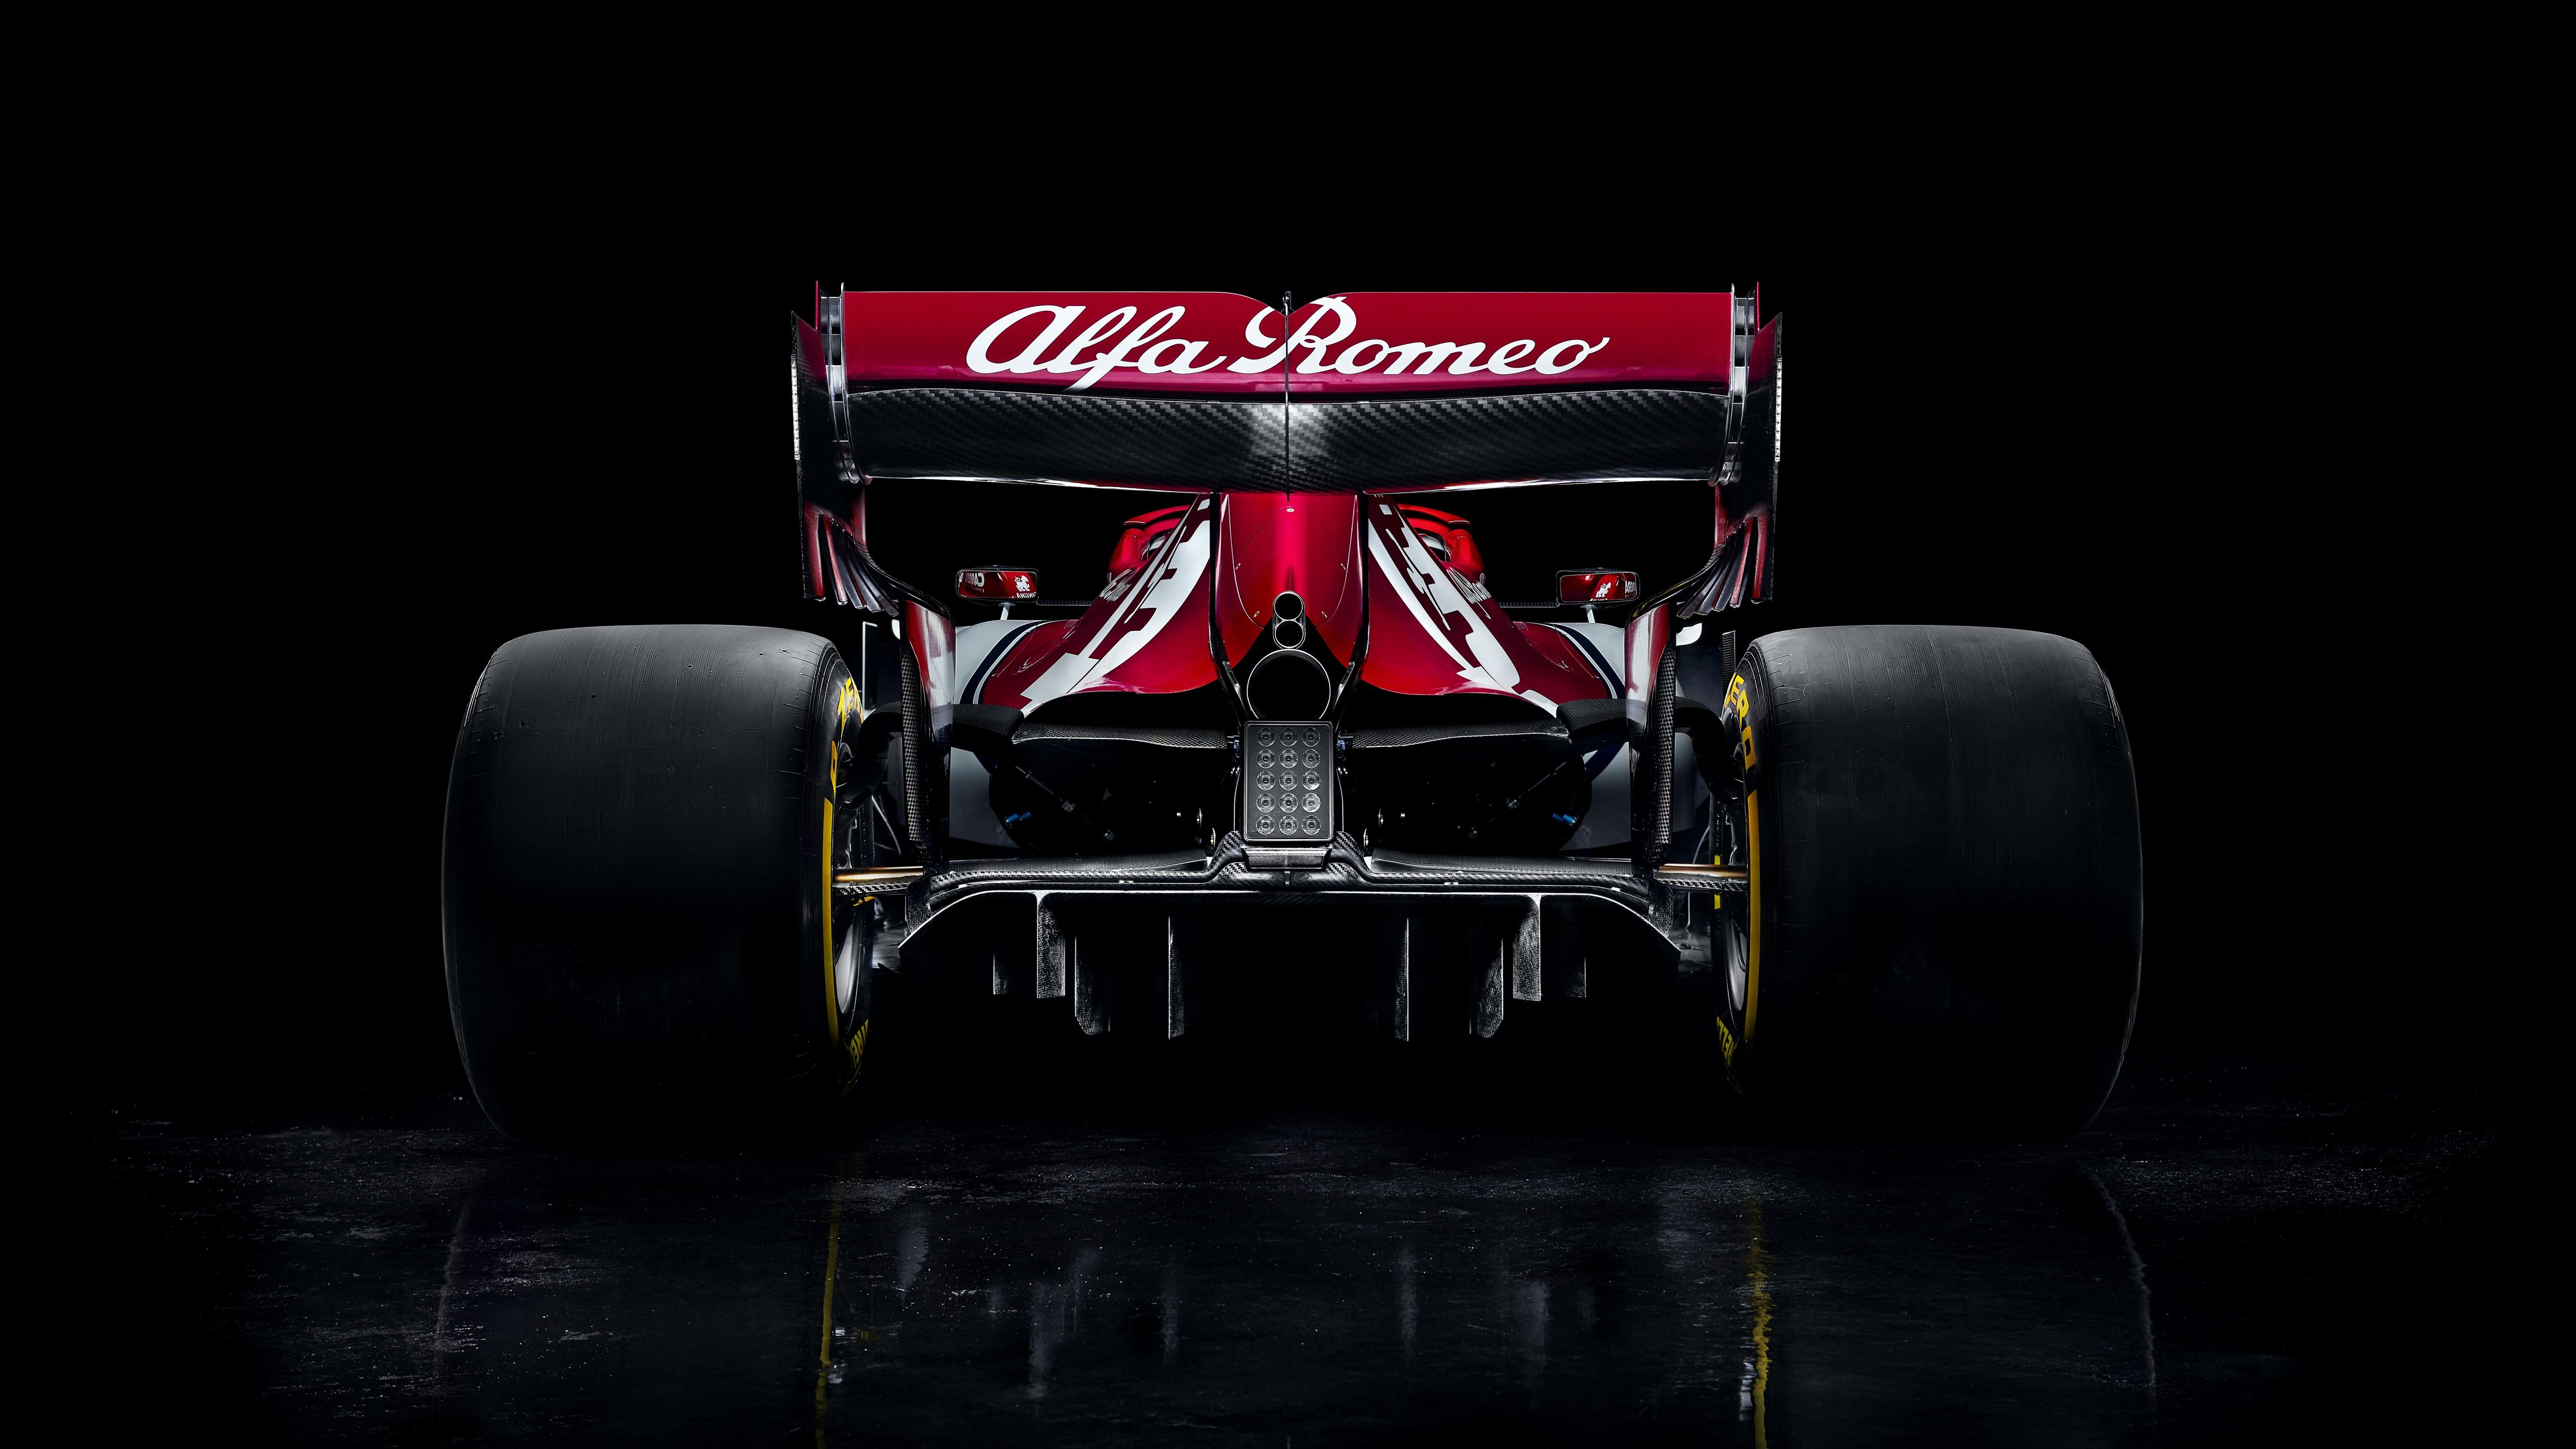 Alfa Romeo C38 Formula 1 2019 4k 8k Wallpaper Hd Car Wallpapers Id 12028